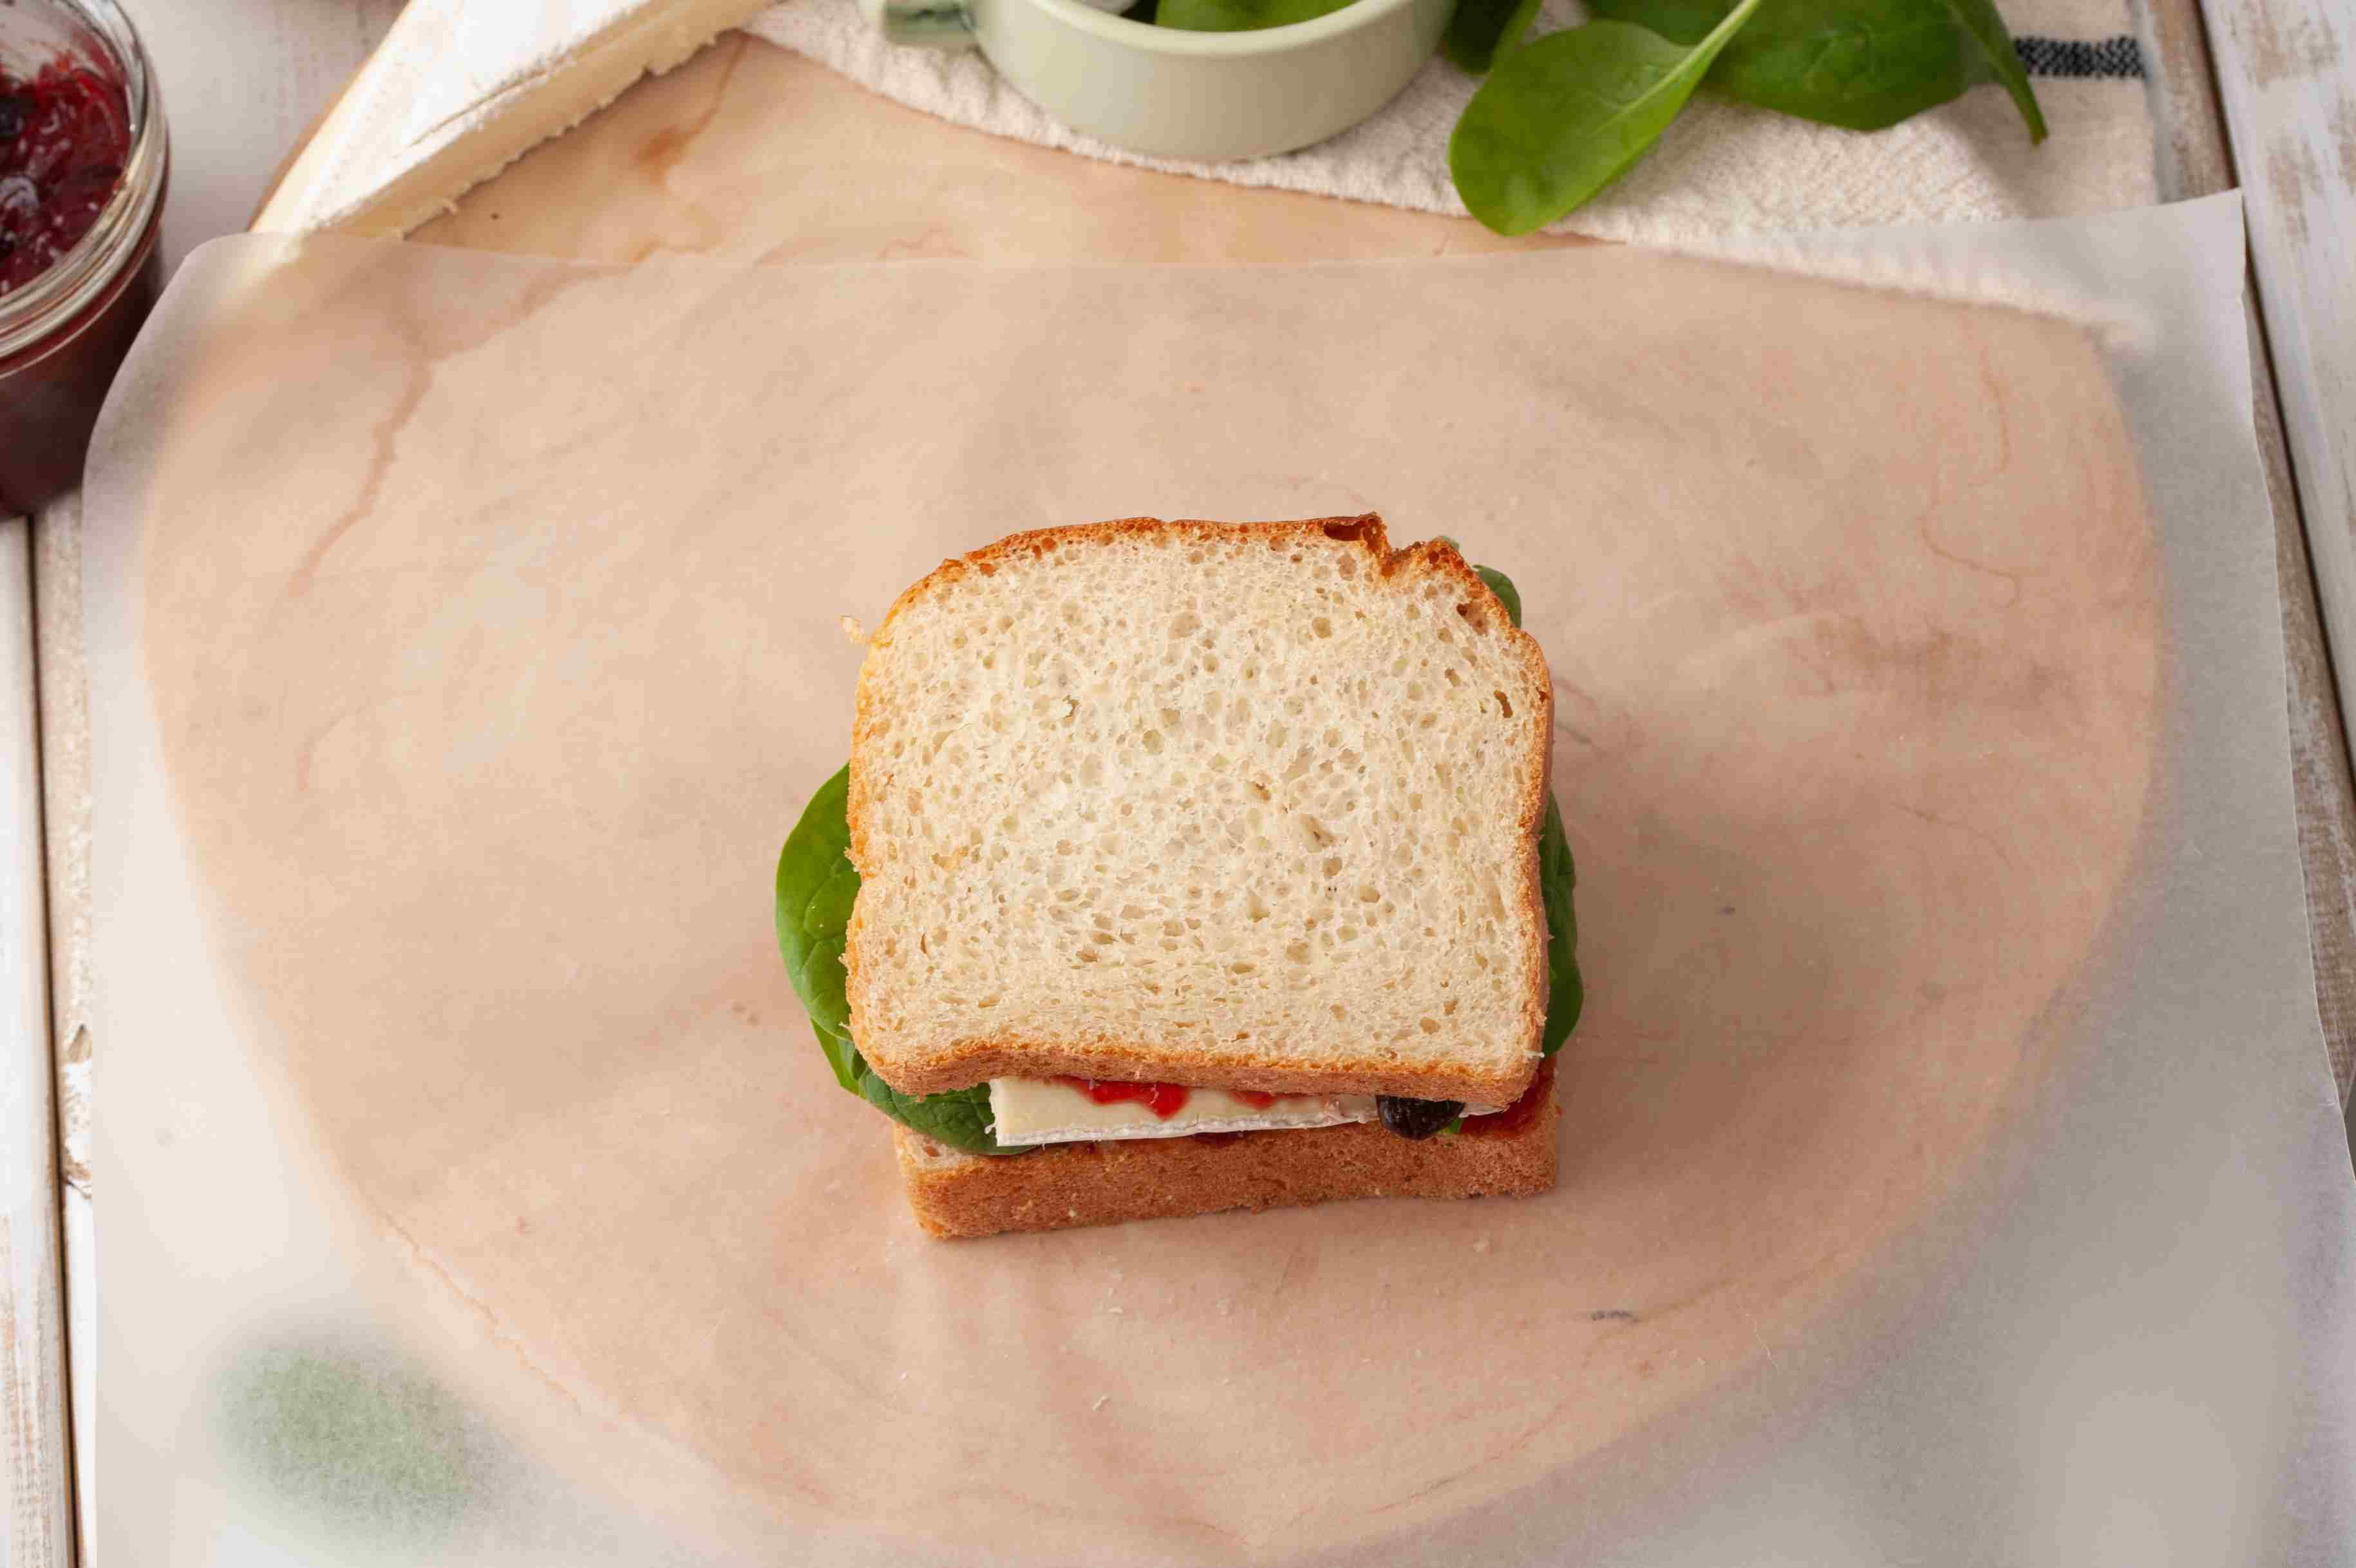 Put sandwich in wax paper